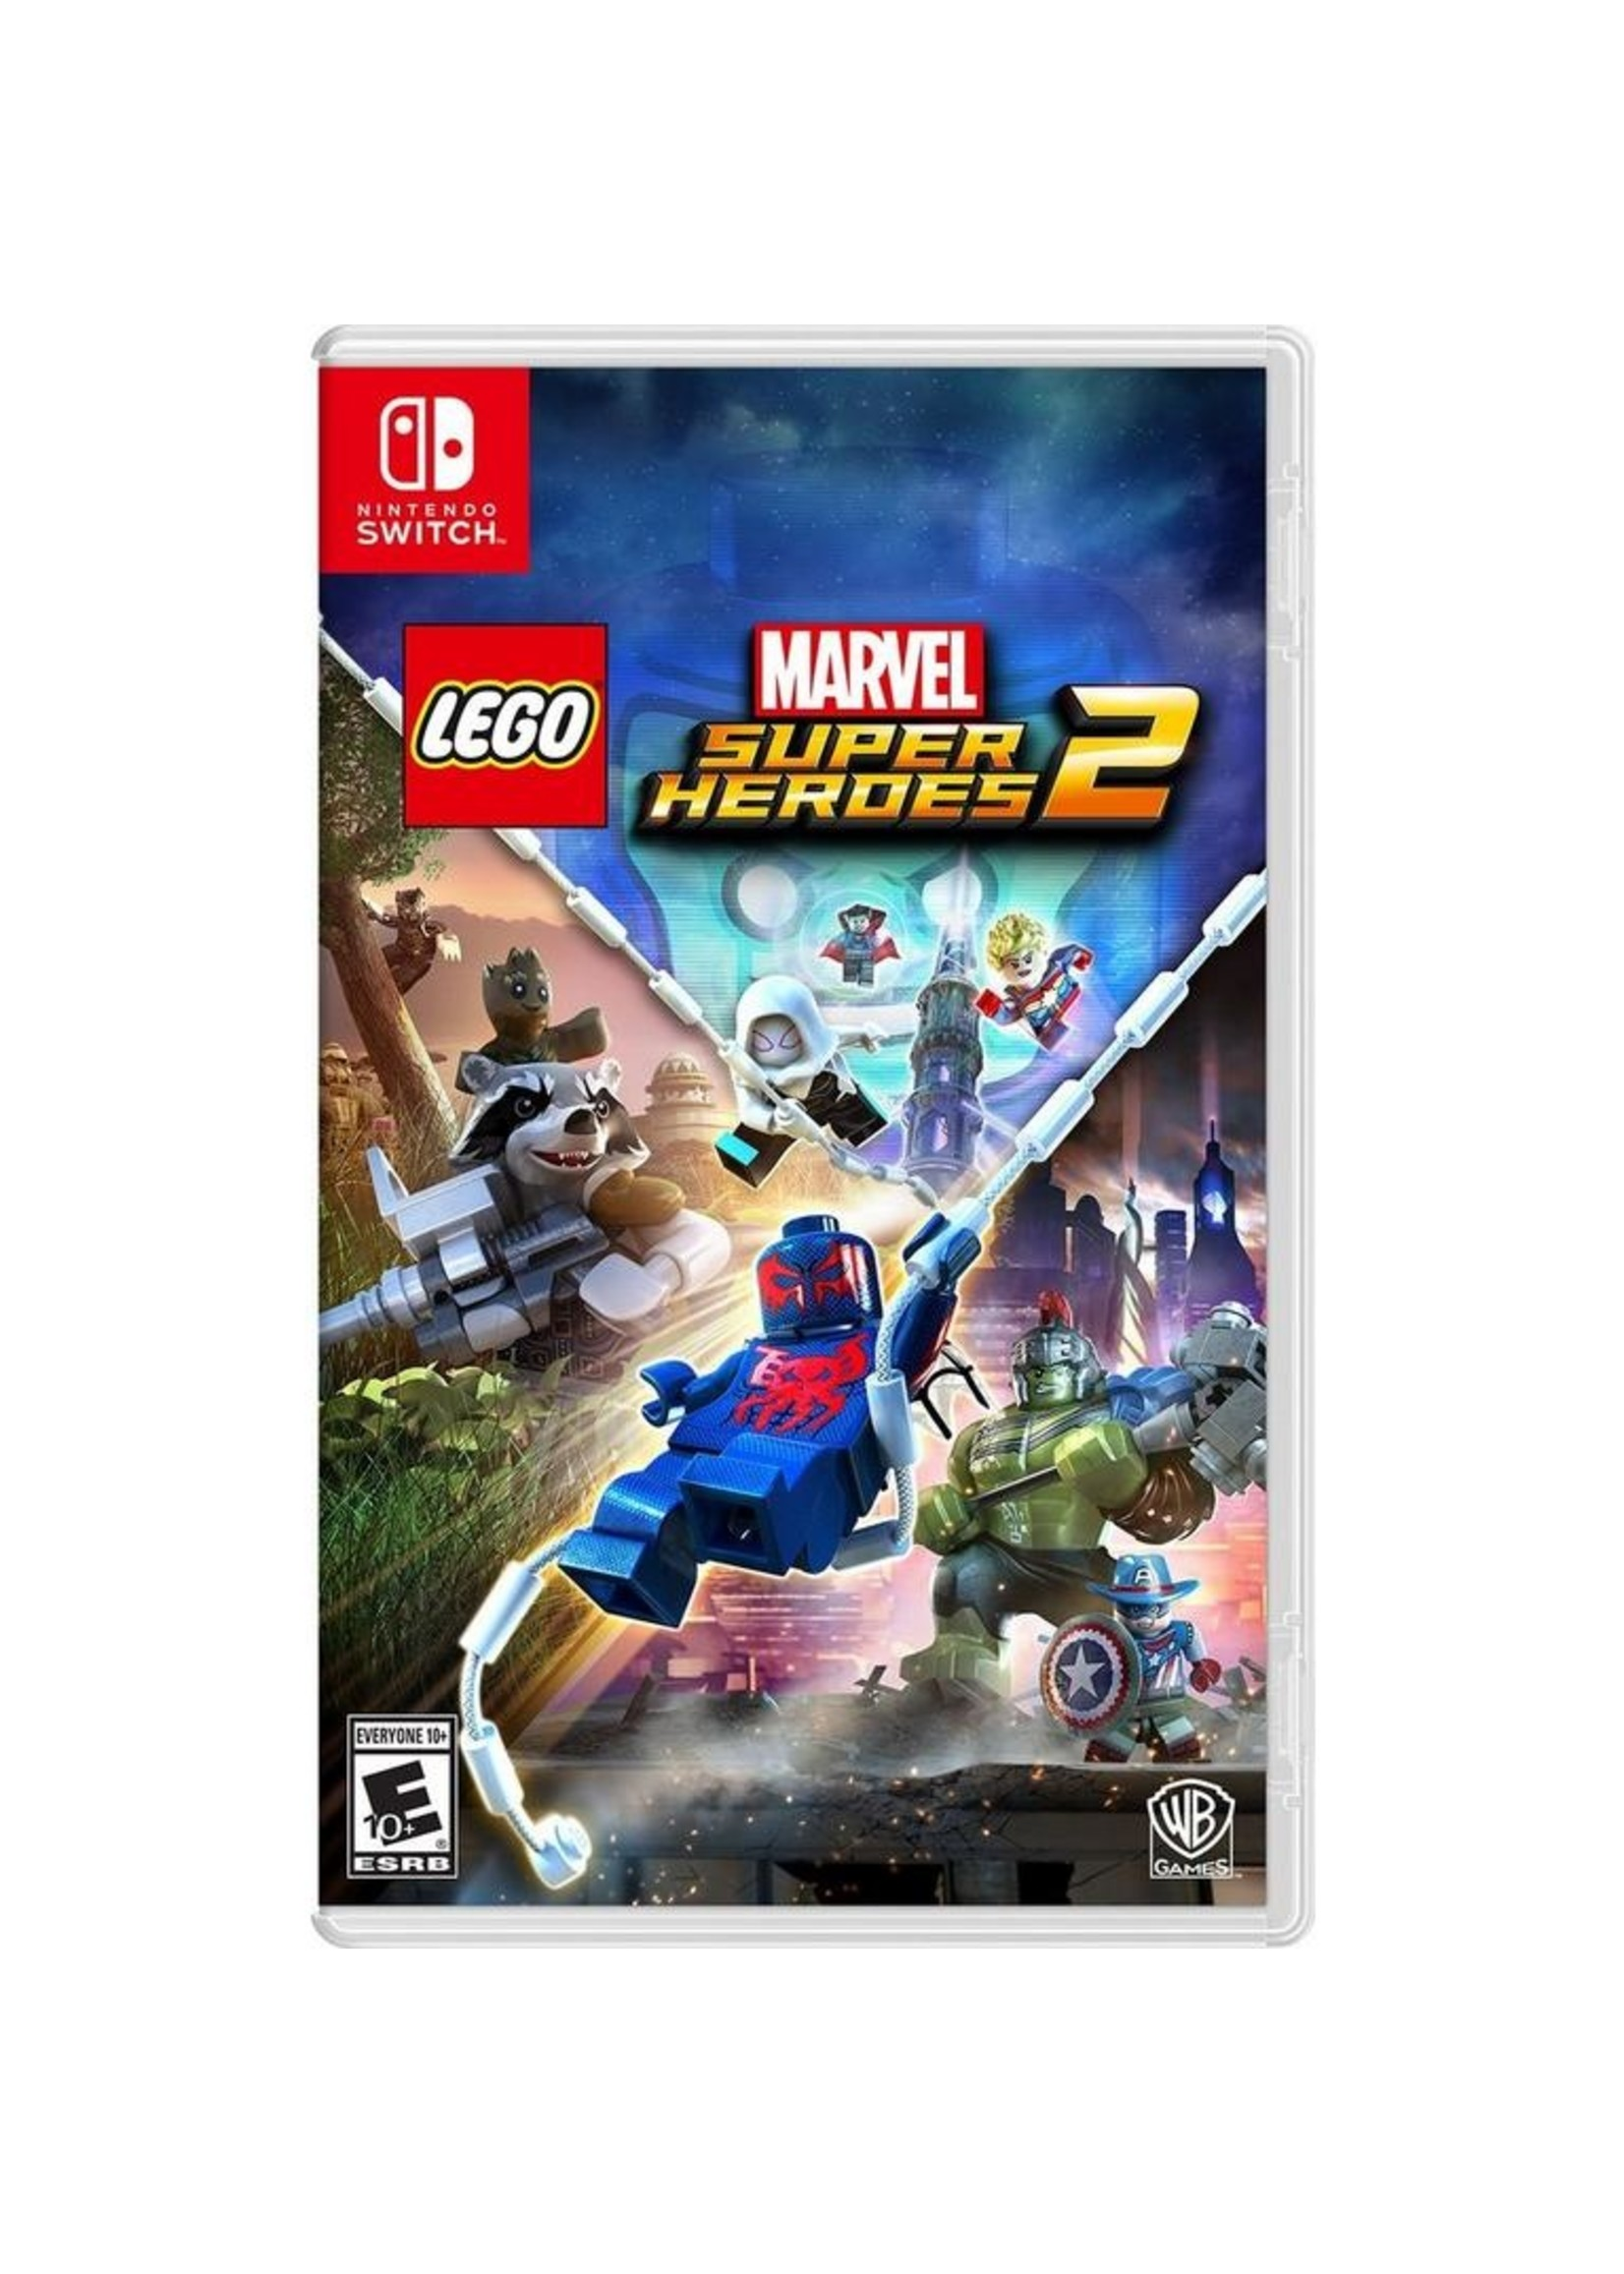 LEGO Marvel Superheroes 2 - SWITCH NEW